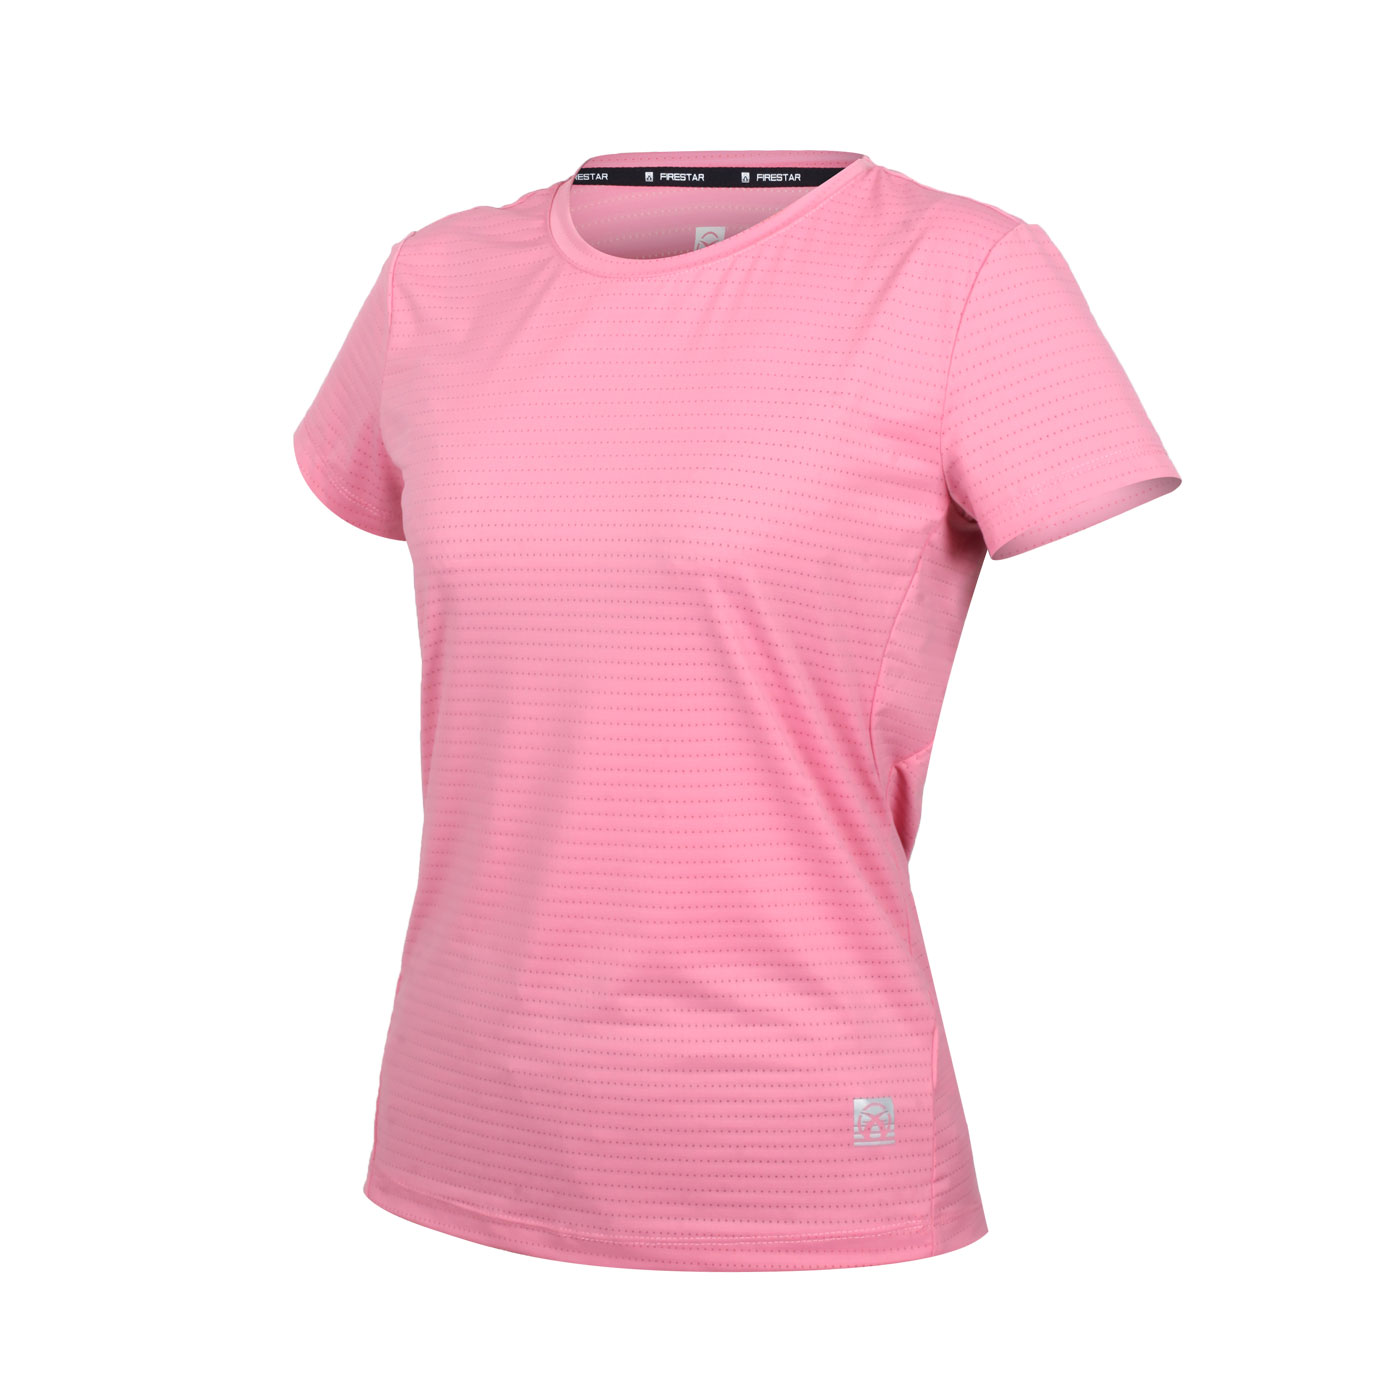 FIRESTAR 女款彈性機能圓領短袖T恤 DL162-43 - 粉紅